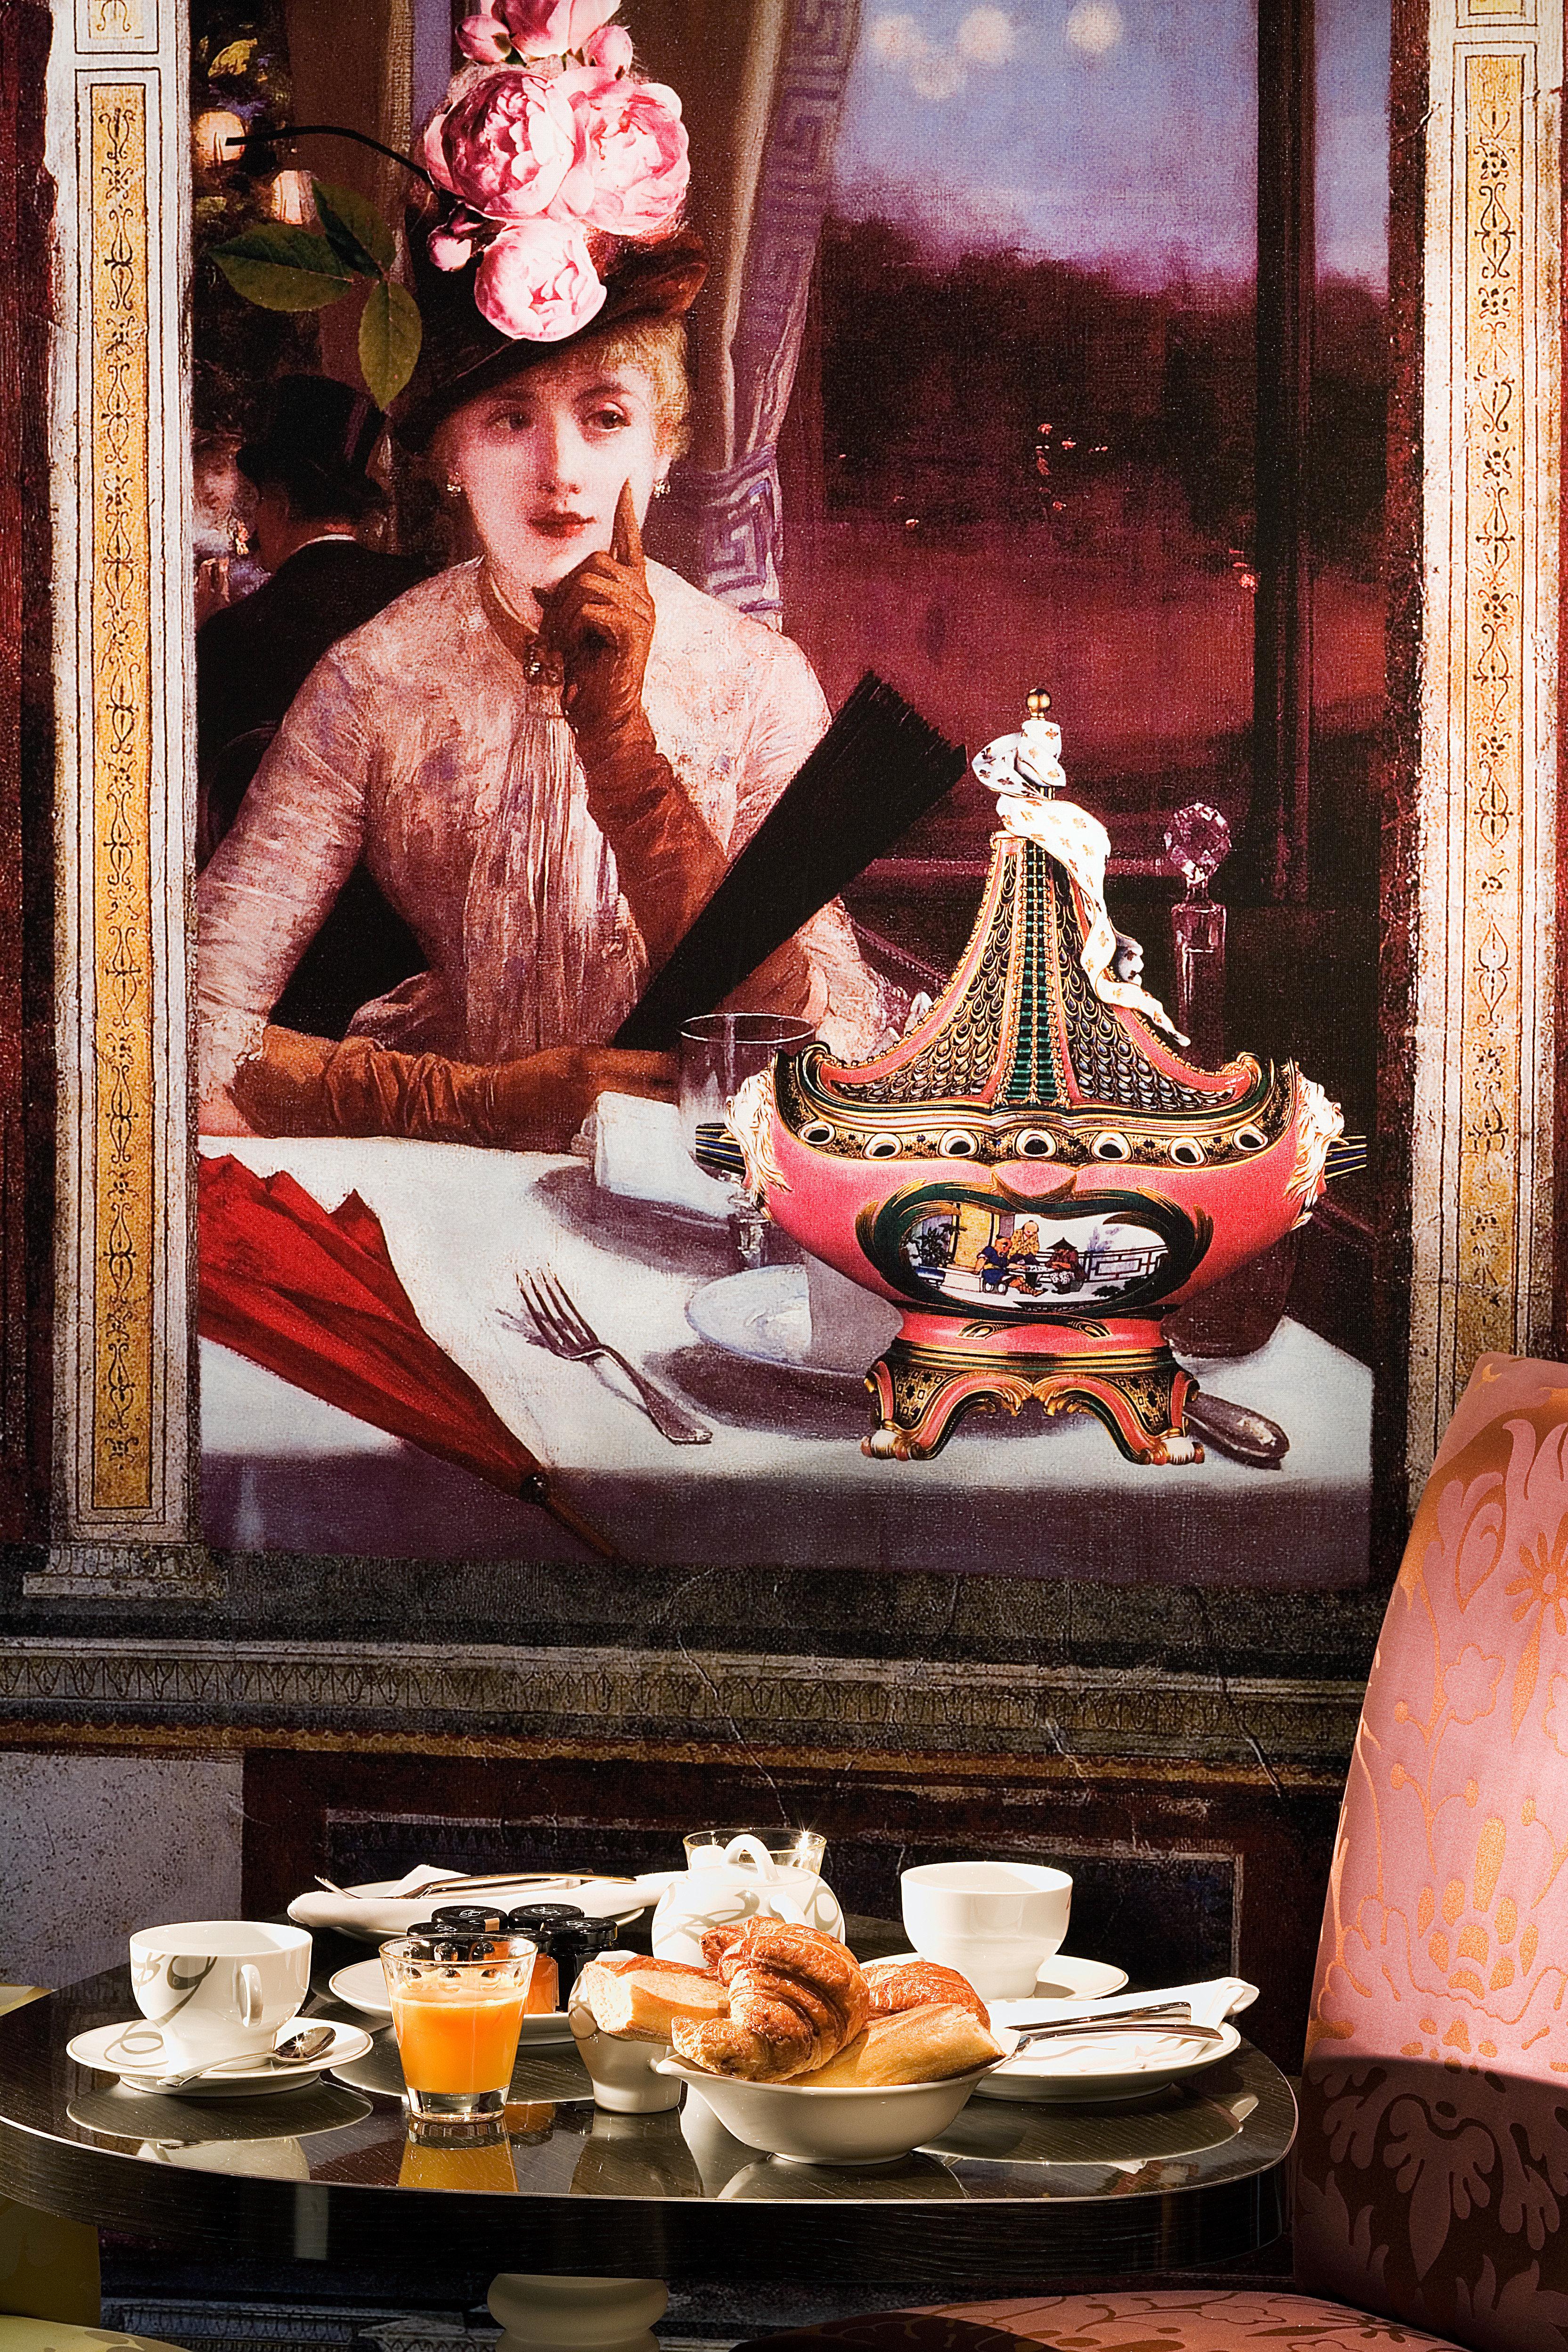 Dining Drink Eat Elegant Historic Trip Ideas art painting restaurant old